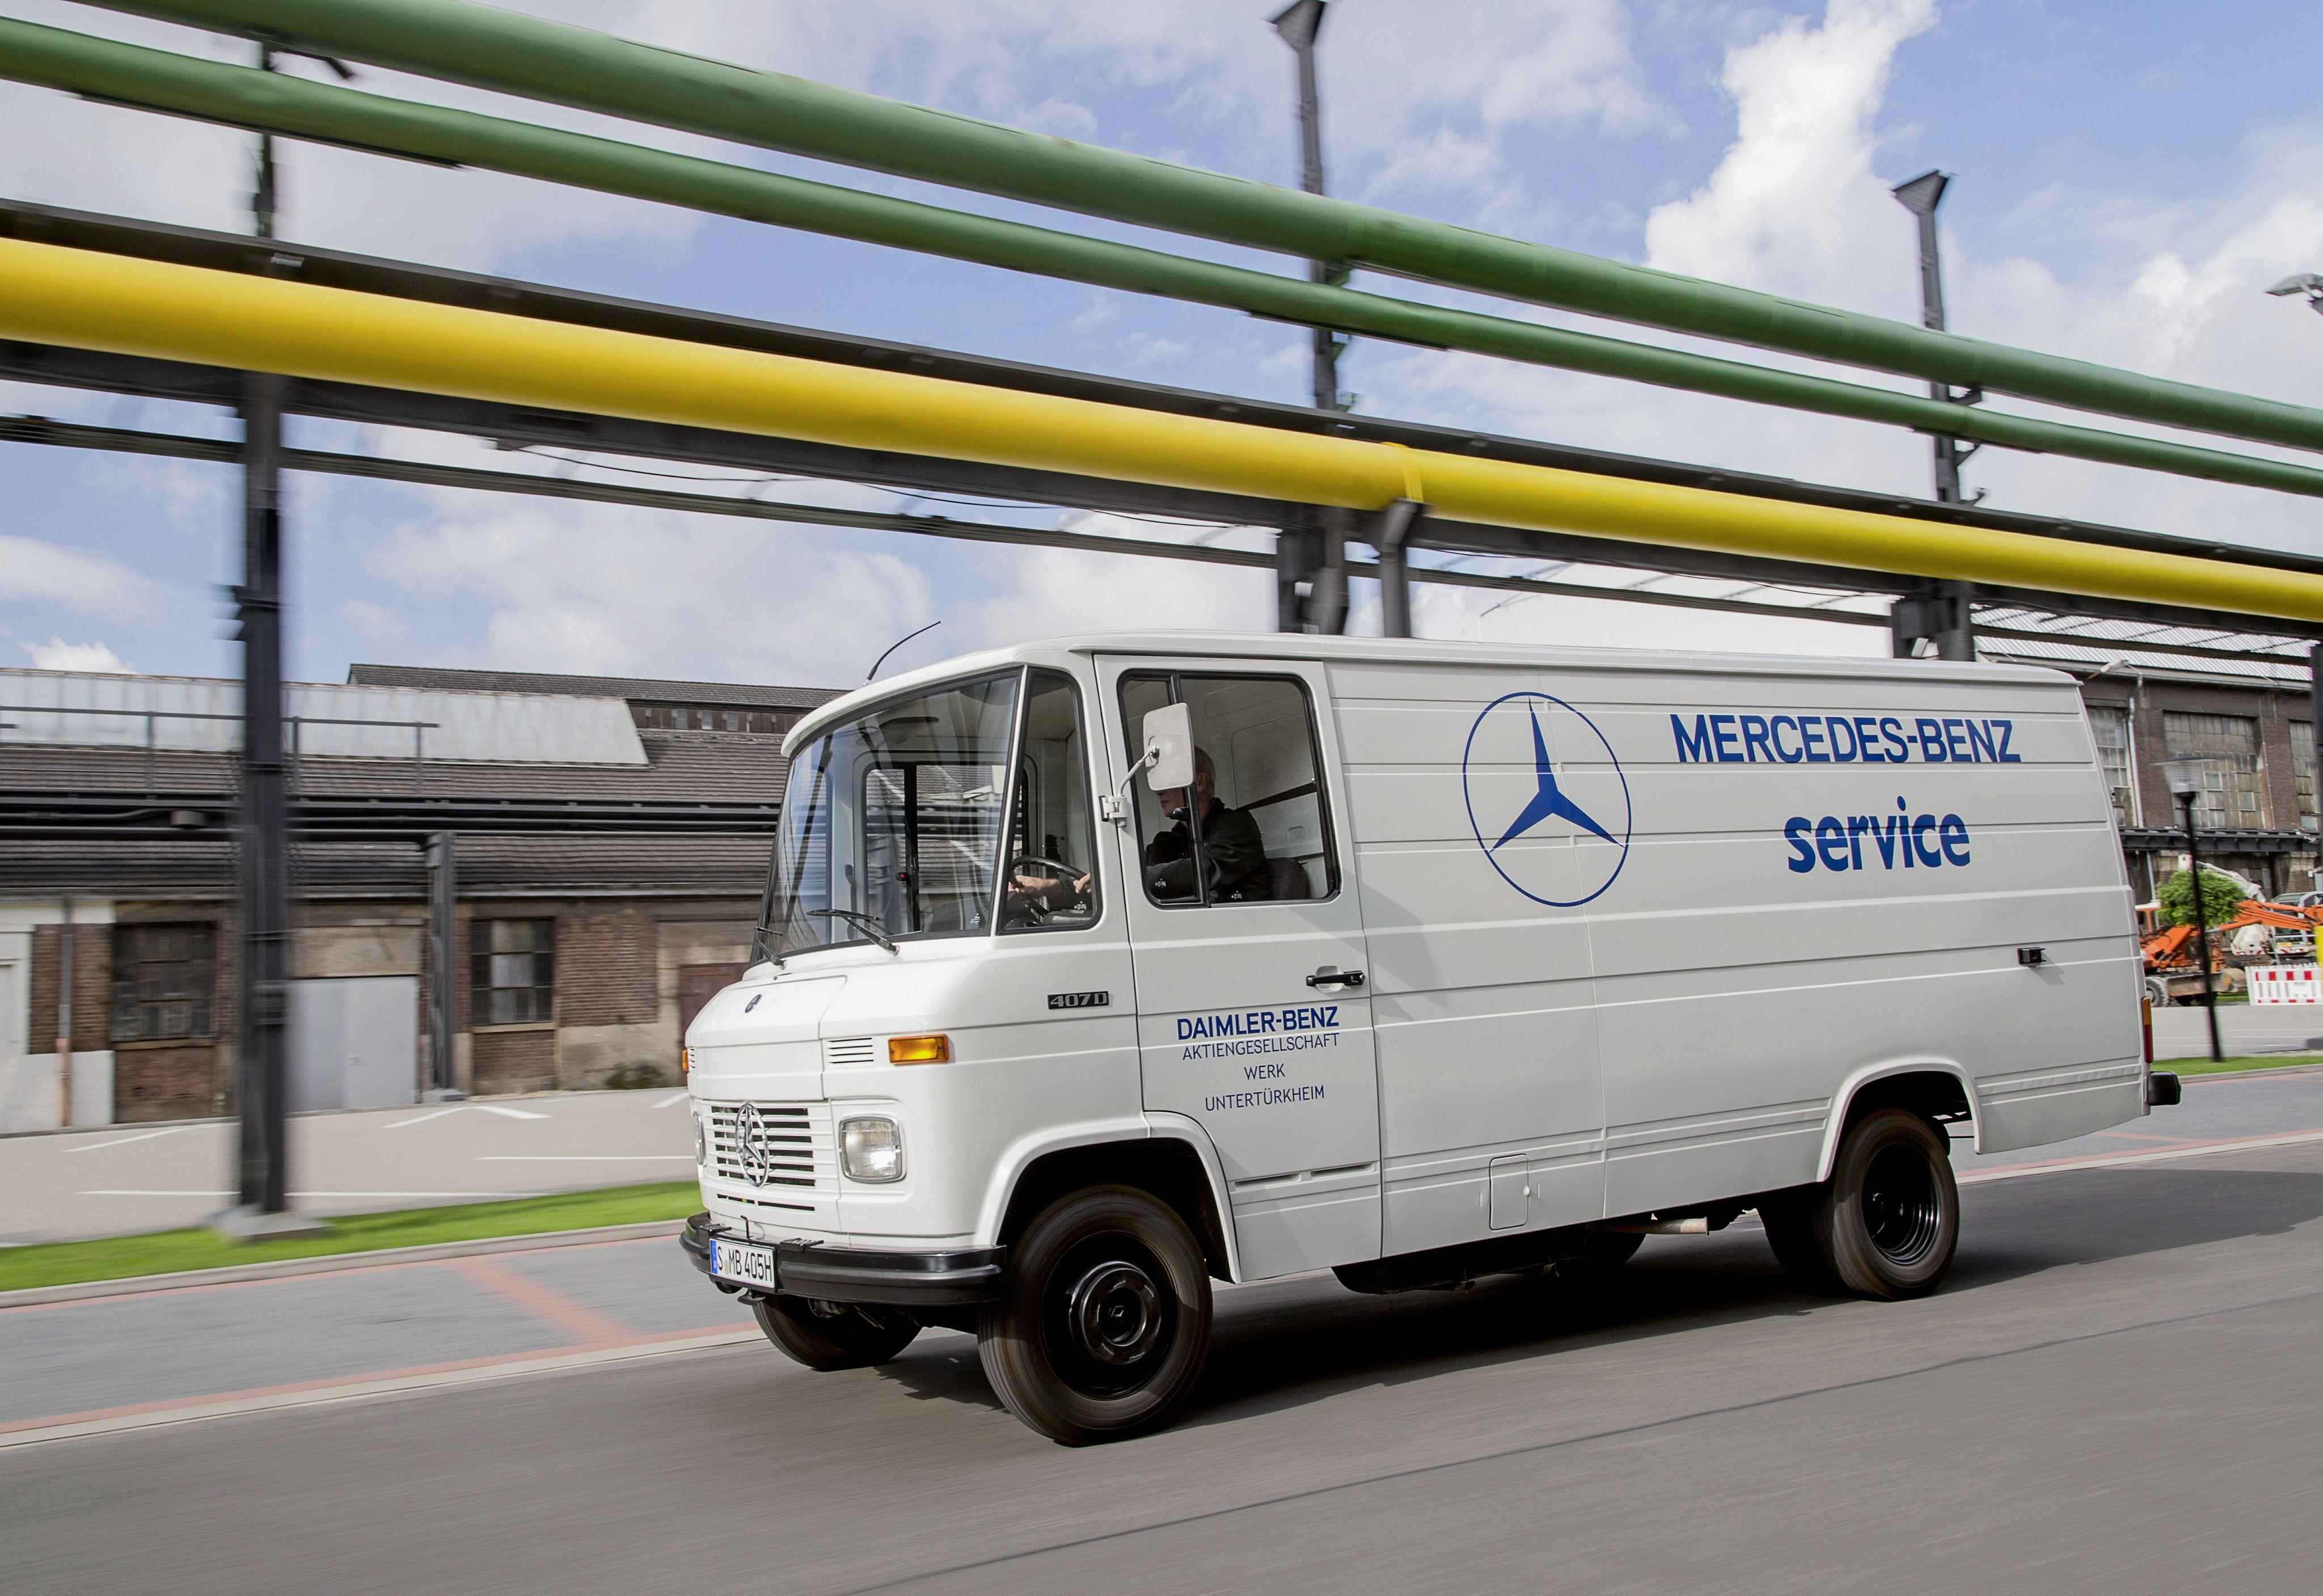 Mercedes benz l 407 d kastenwagen 39 for Mercedes benz service appointment